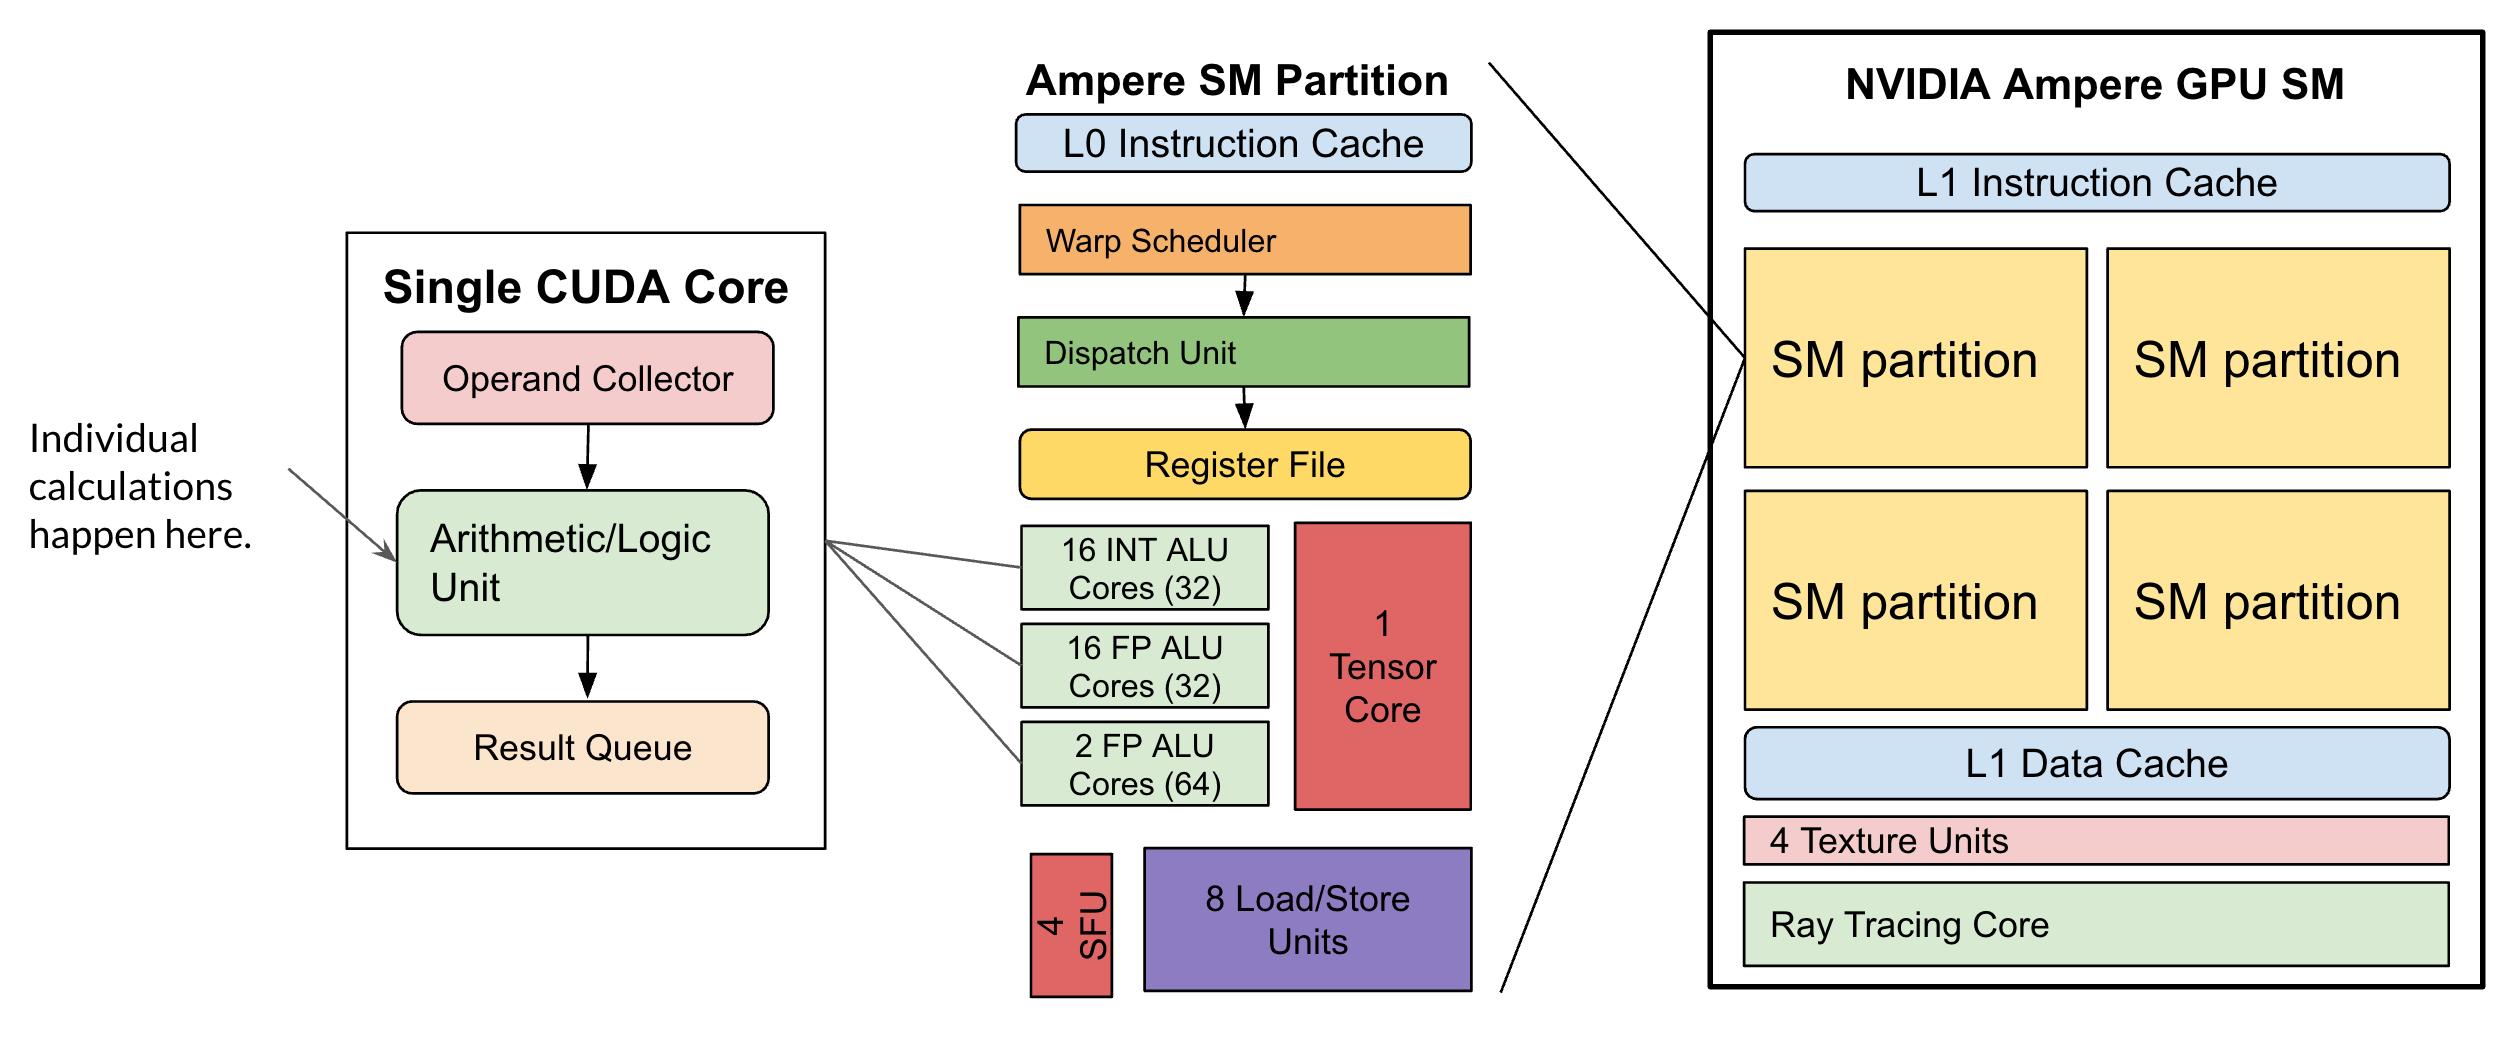 Diagram of NVIDIA Ampere GPU components